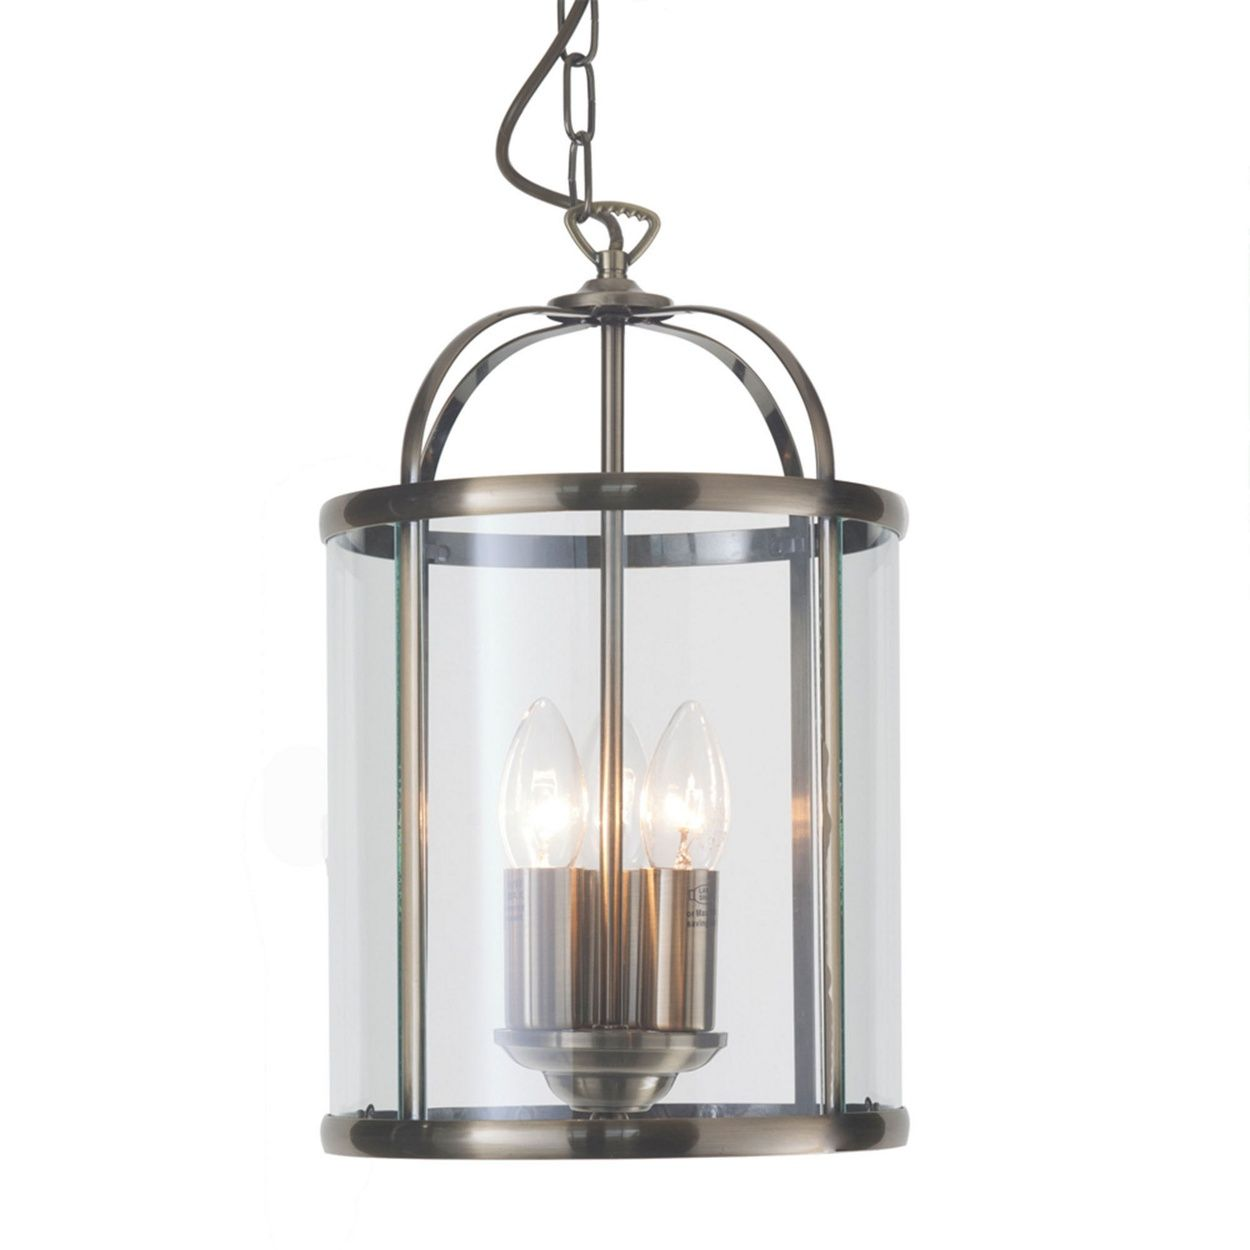 Edwardian hallway lighting  Litecraft  Light Hall Lantern Ceiling Pendant  Antique Brass at